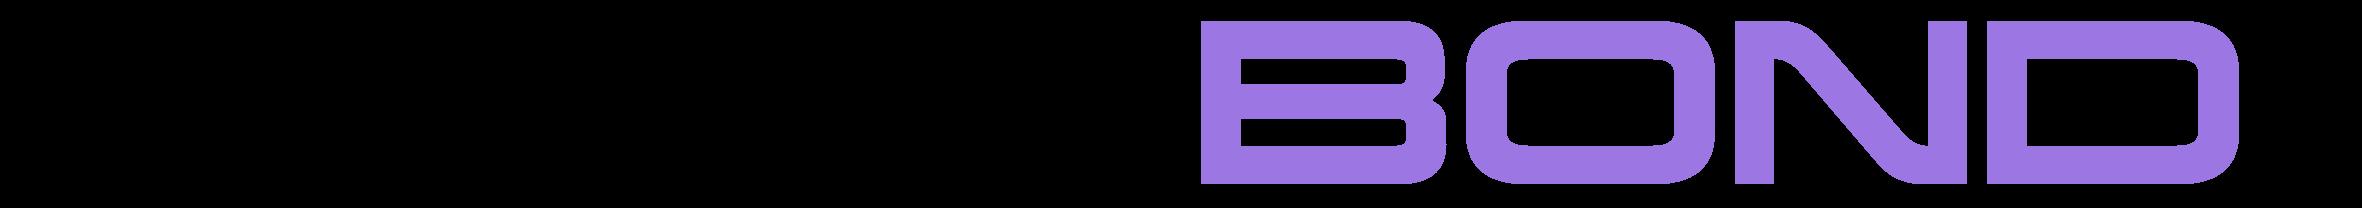 logo-ridelbond.png